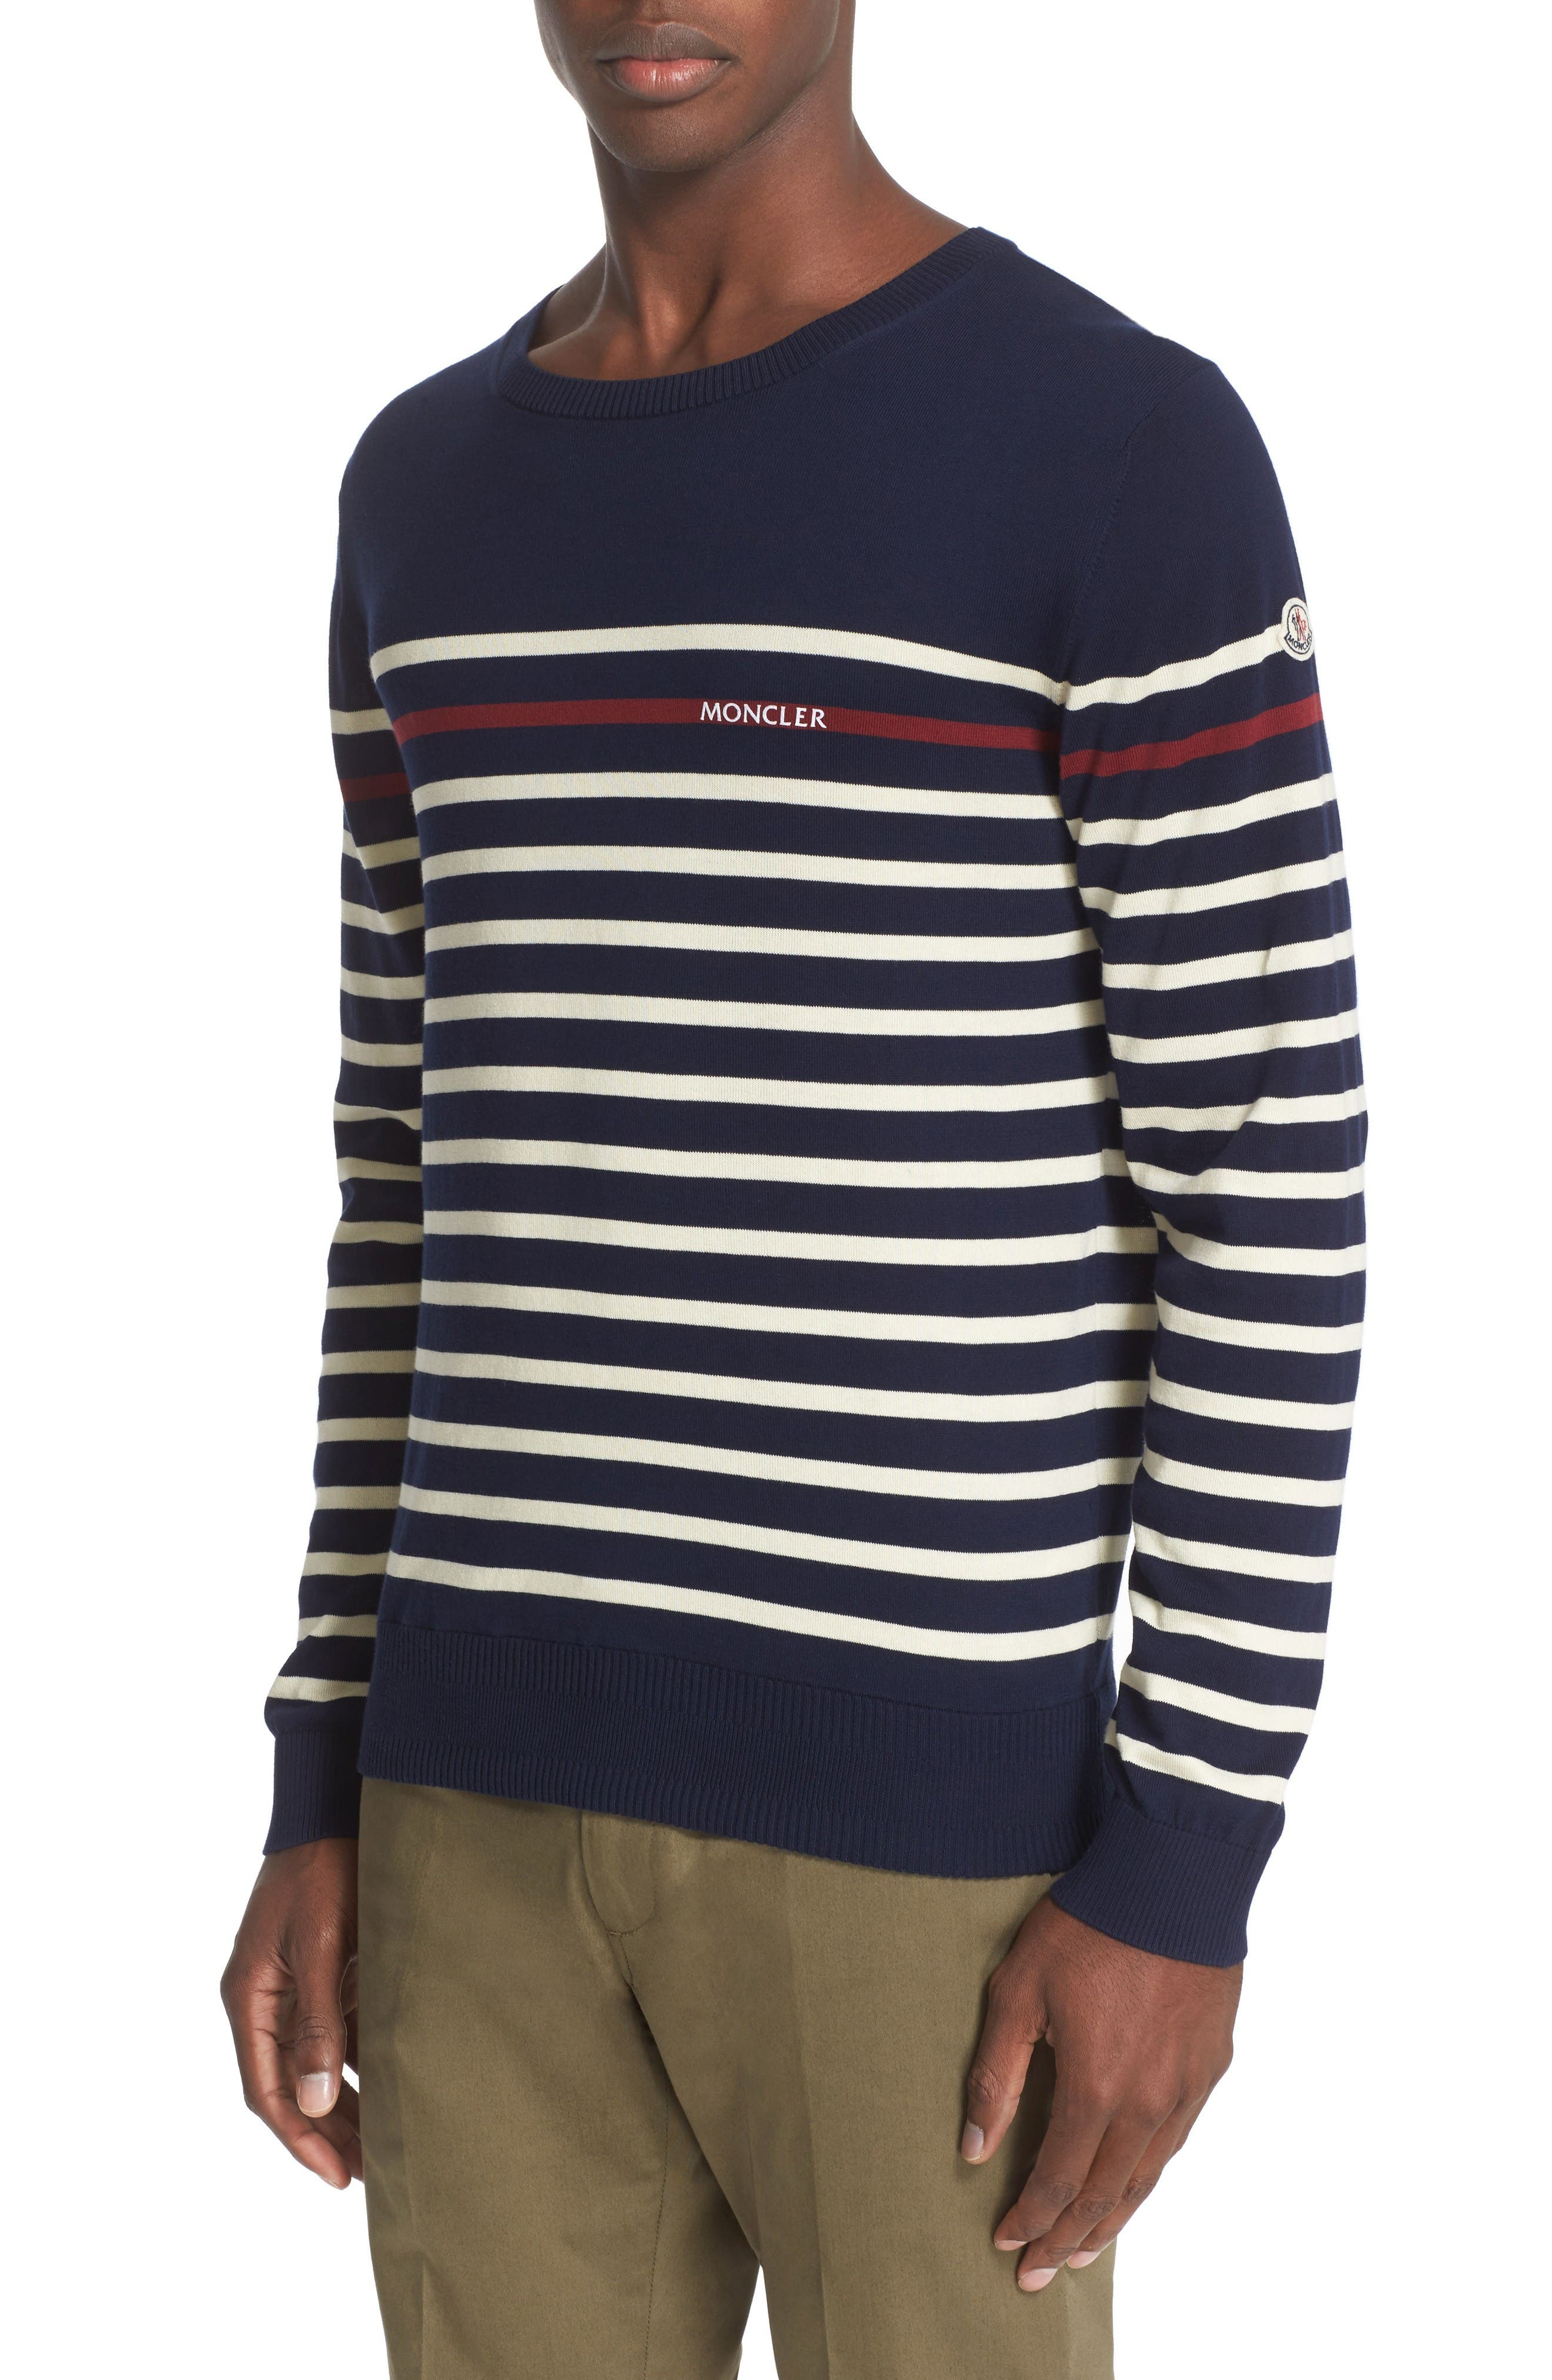 Moncler Stripe Cotton Sweater